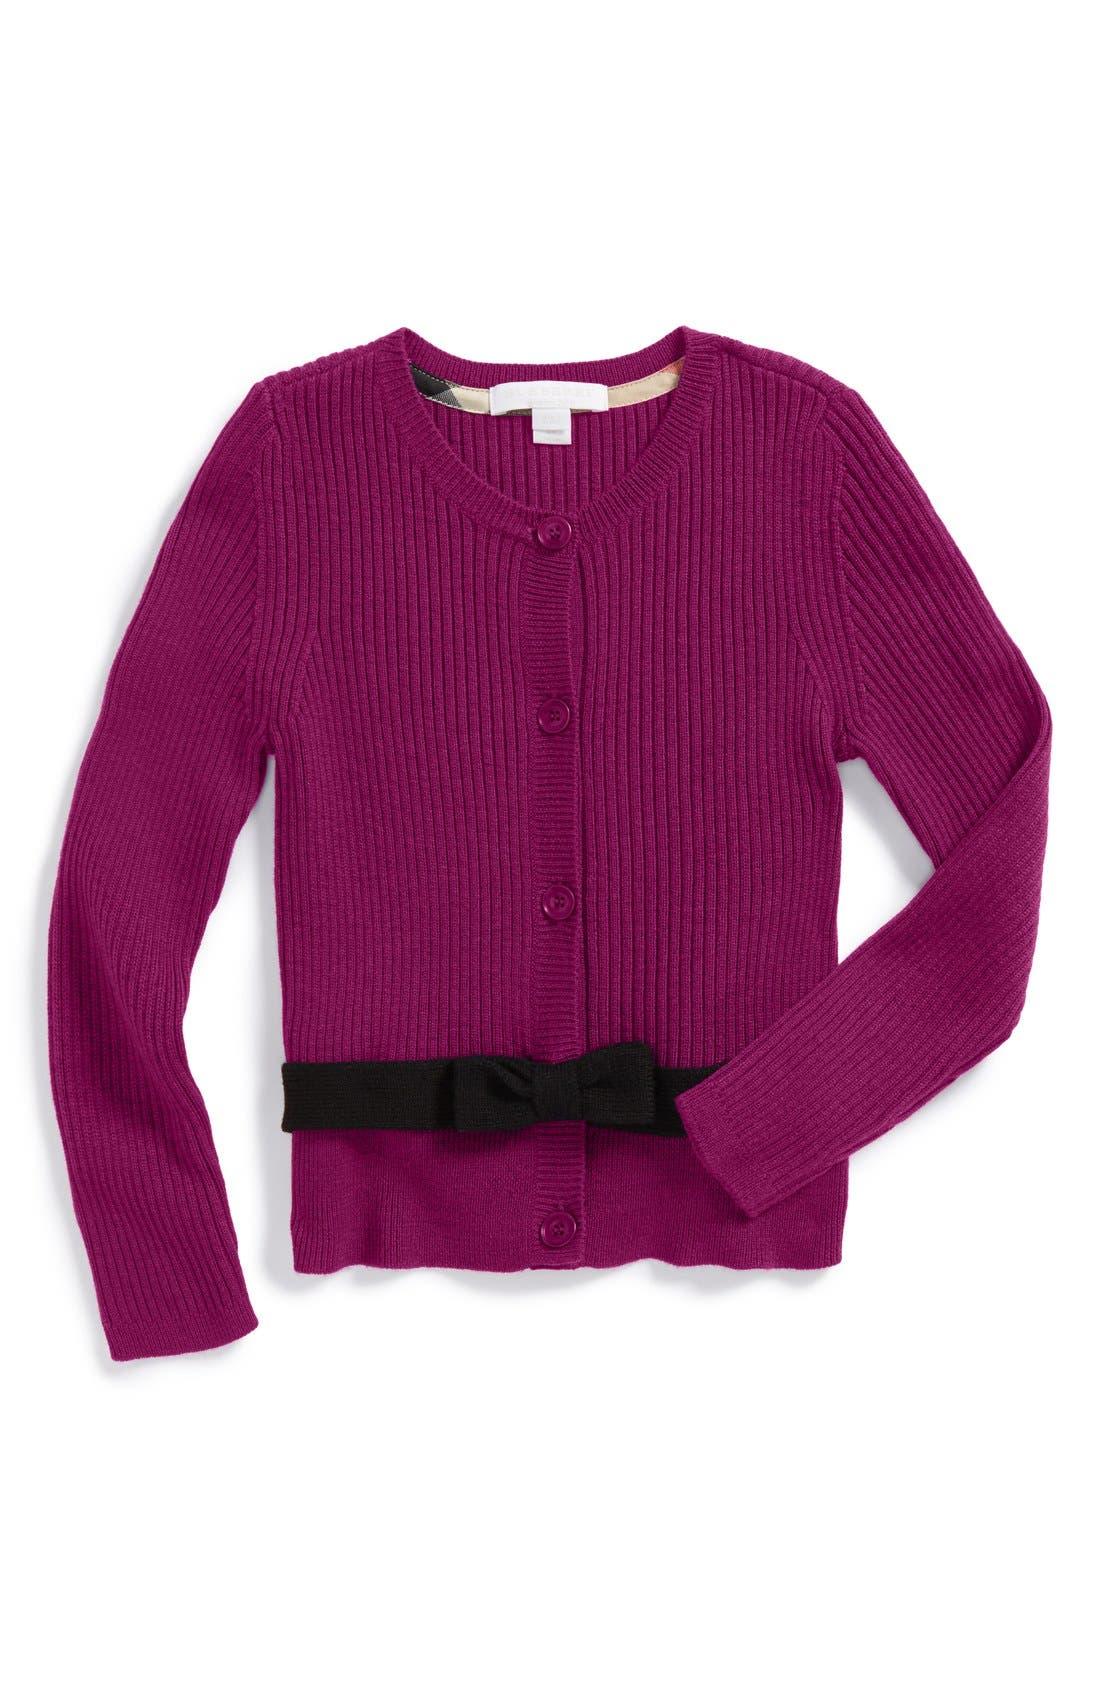 Main Image - Burberry Merino Wool Belted Cardigan (Little Girls & Big Girls)